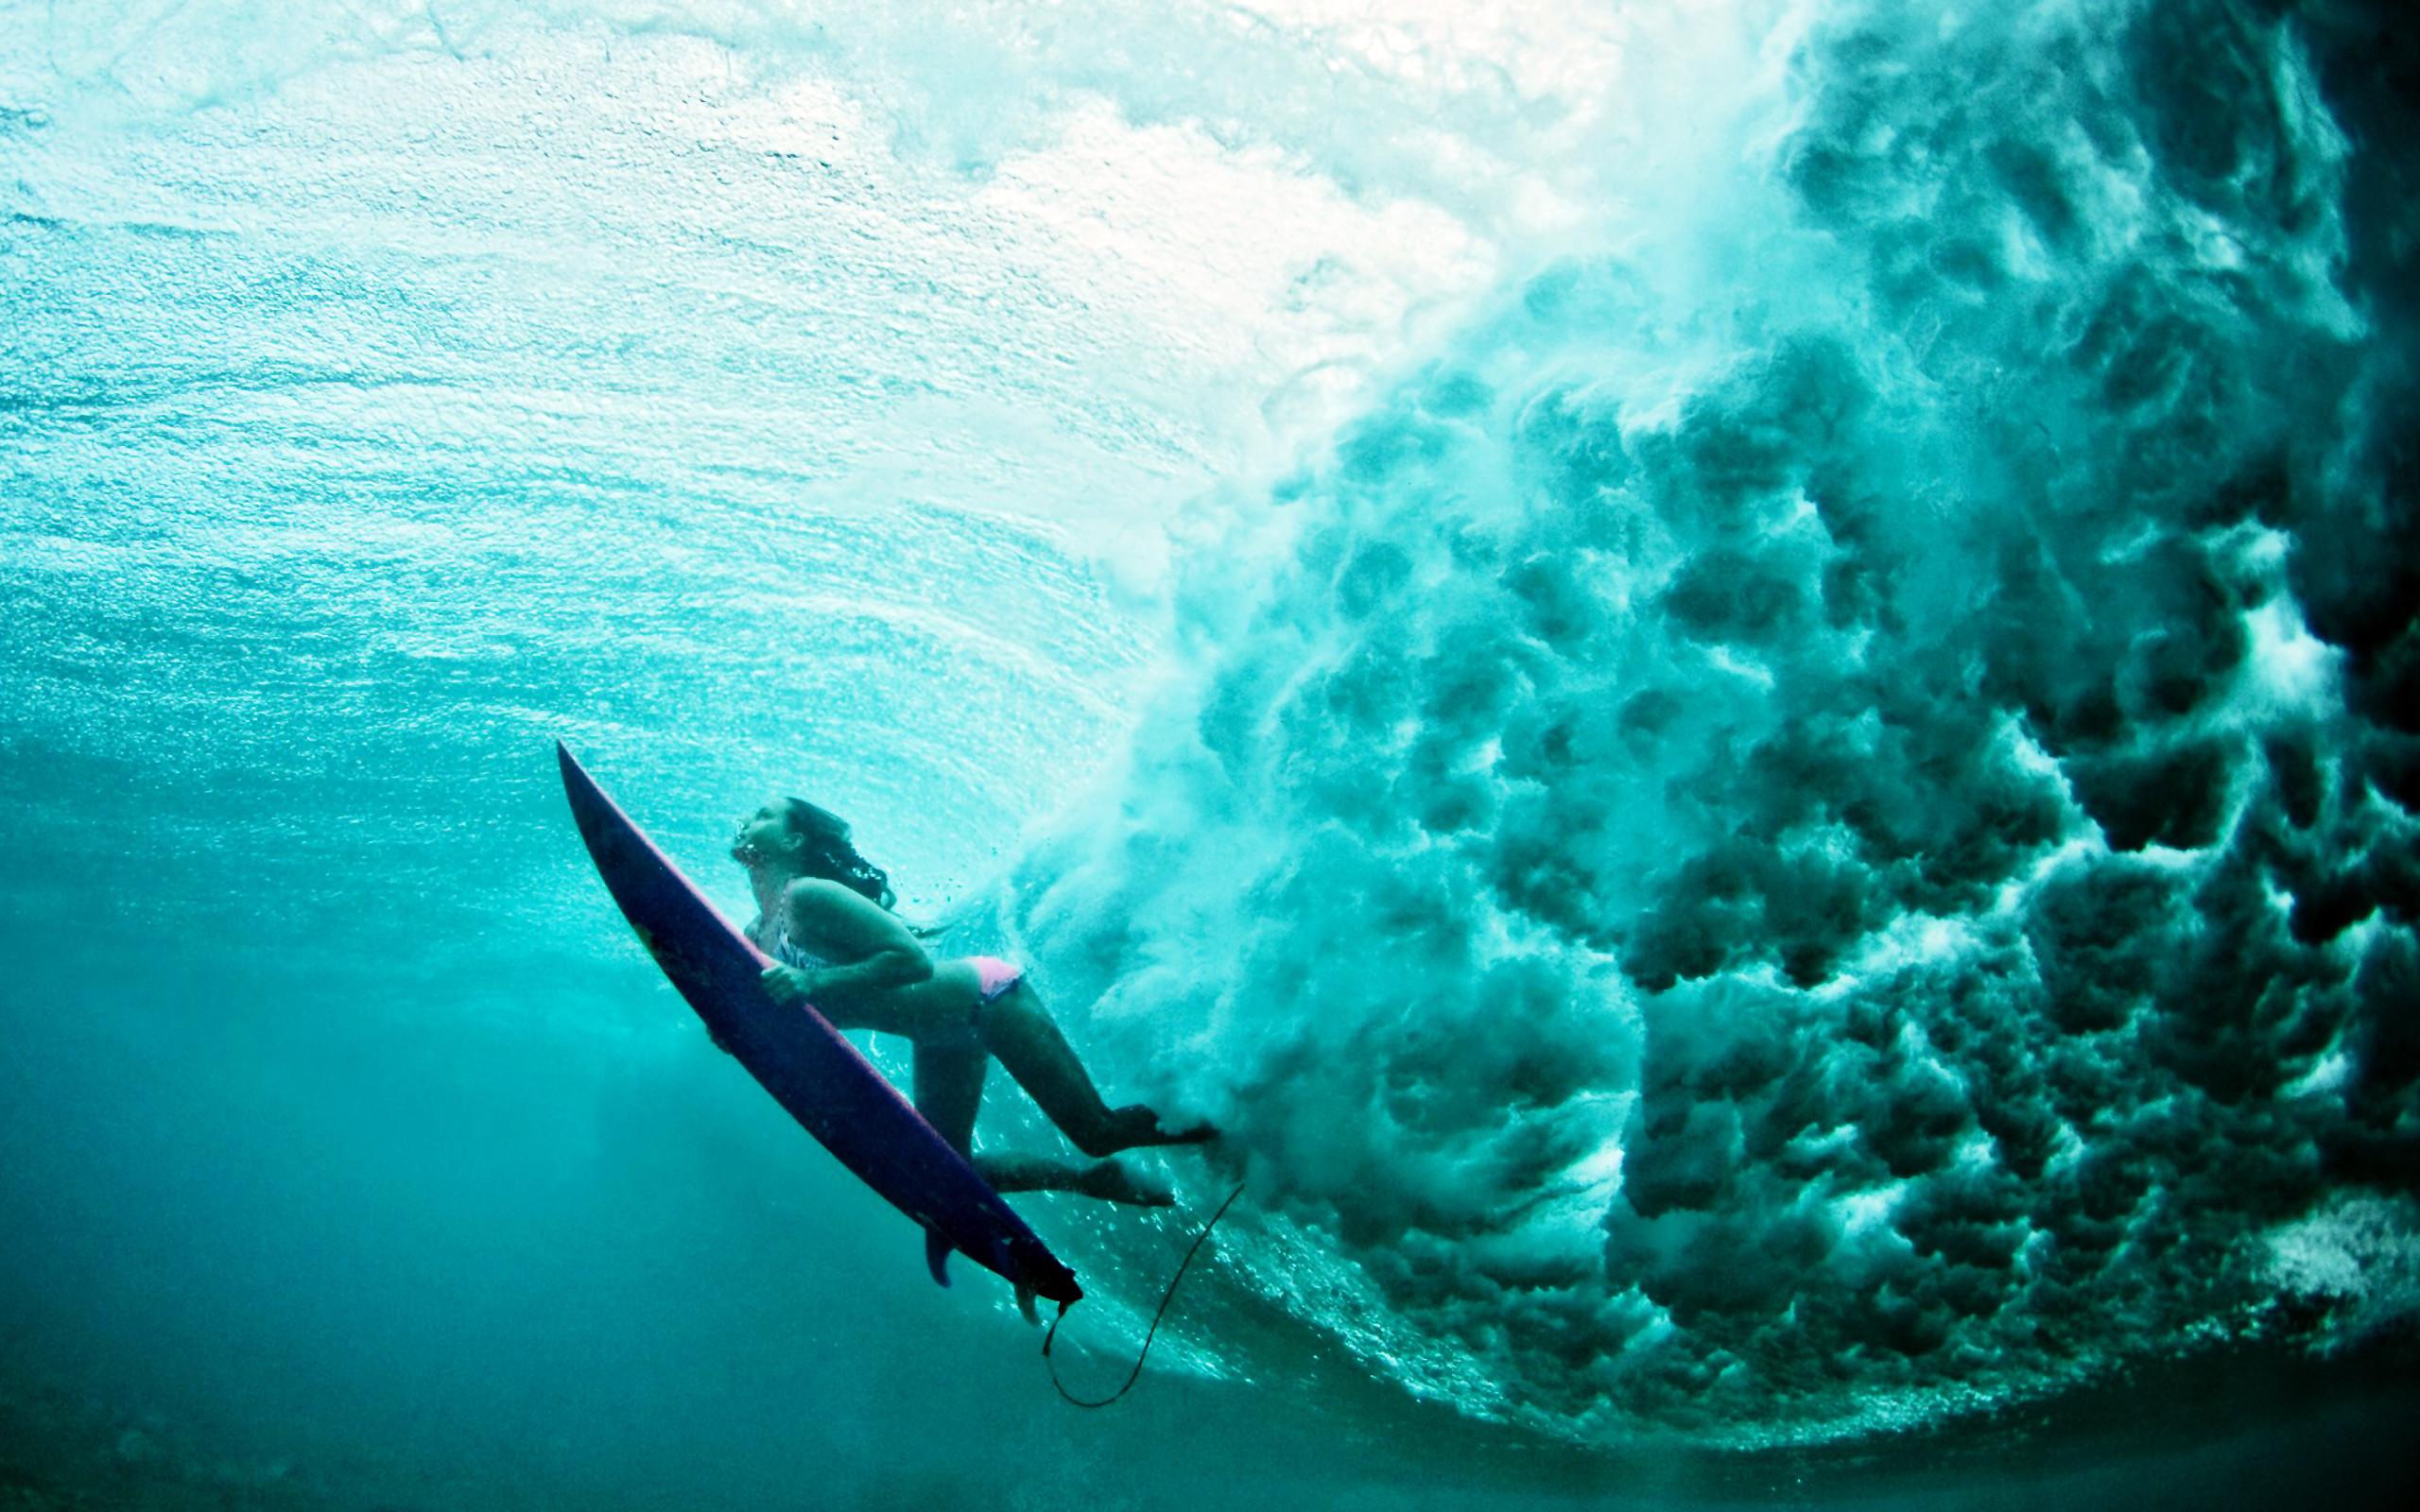 Girls Surfing Wallpaper